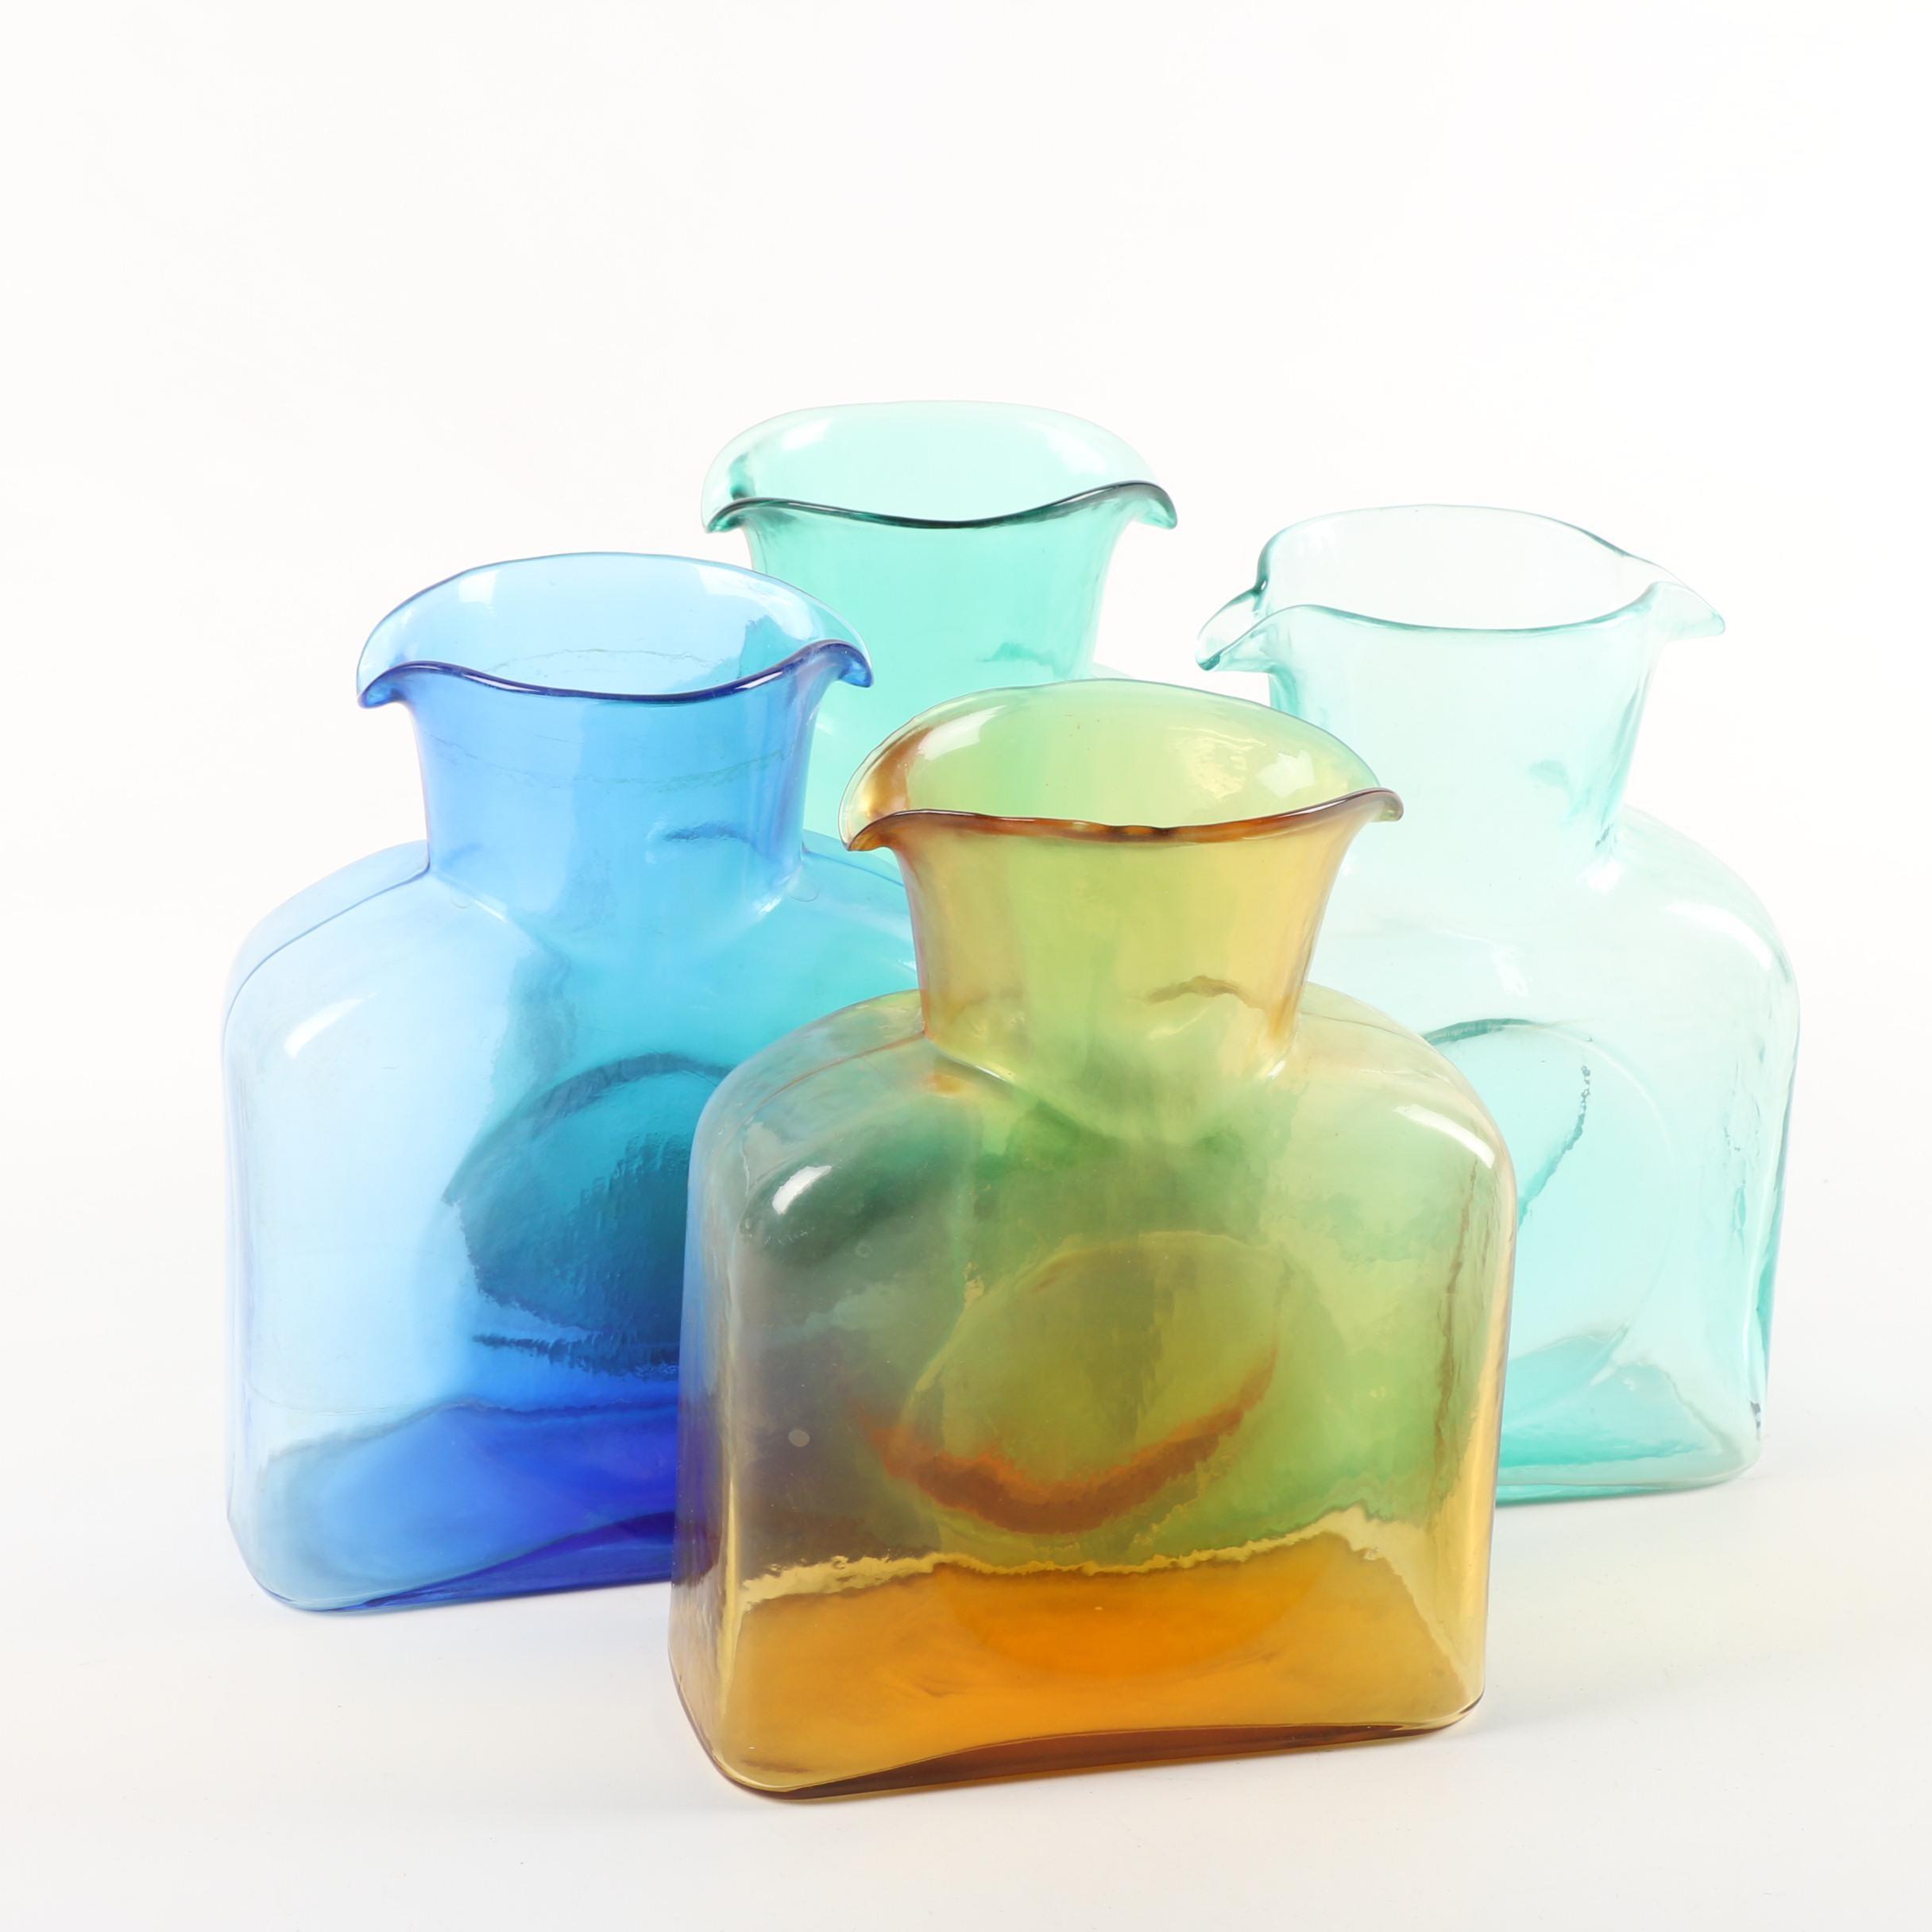 Handcrafted Blenko Art Glass Water Bottles